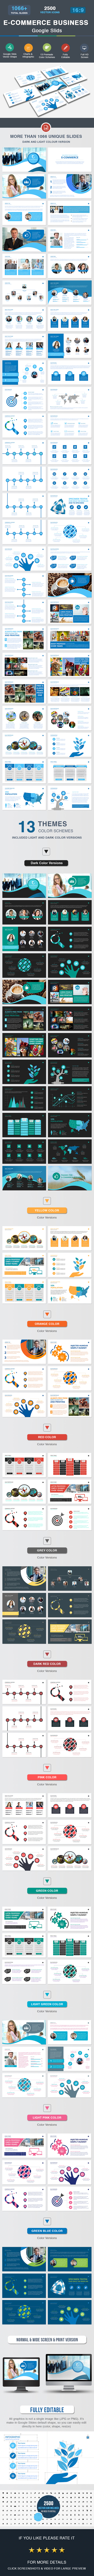 E-Commerce Business Google Slids - Google Slides Presentation Templates